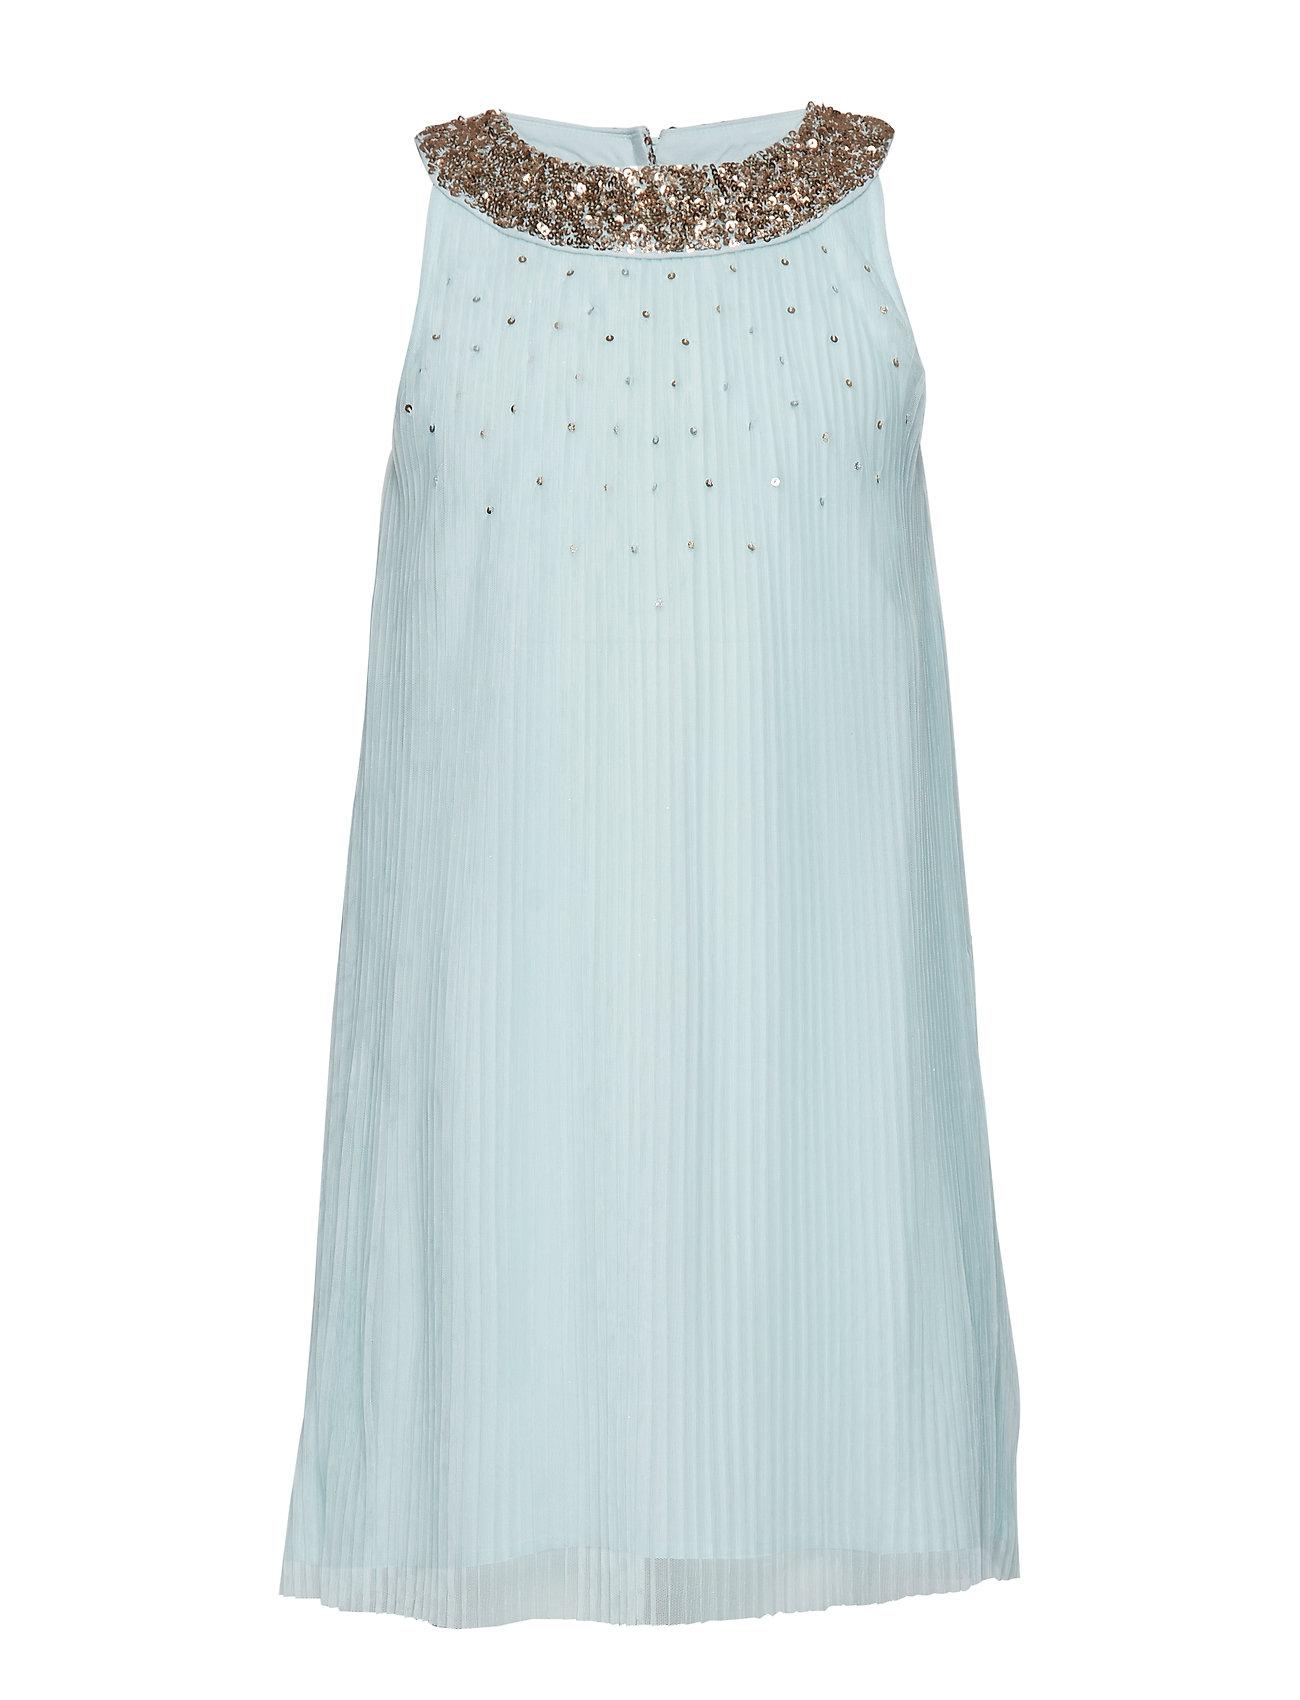 Billieblush CEREMONY DRESS - TURQUOISE